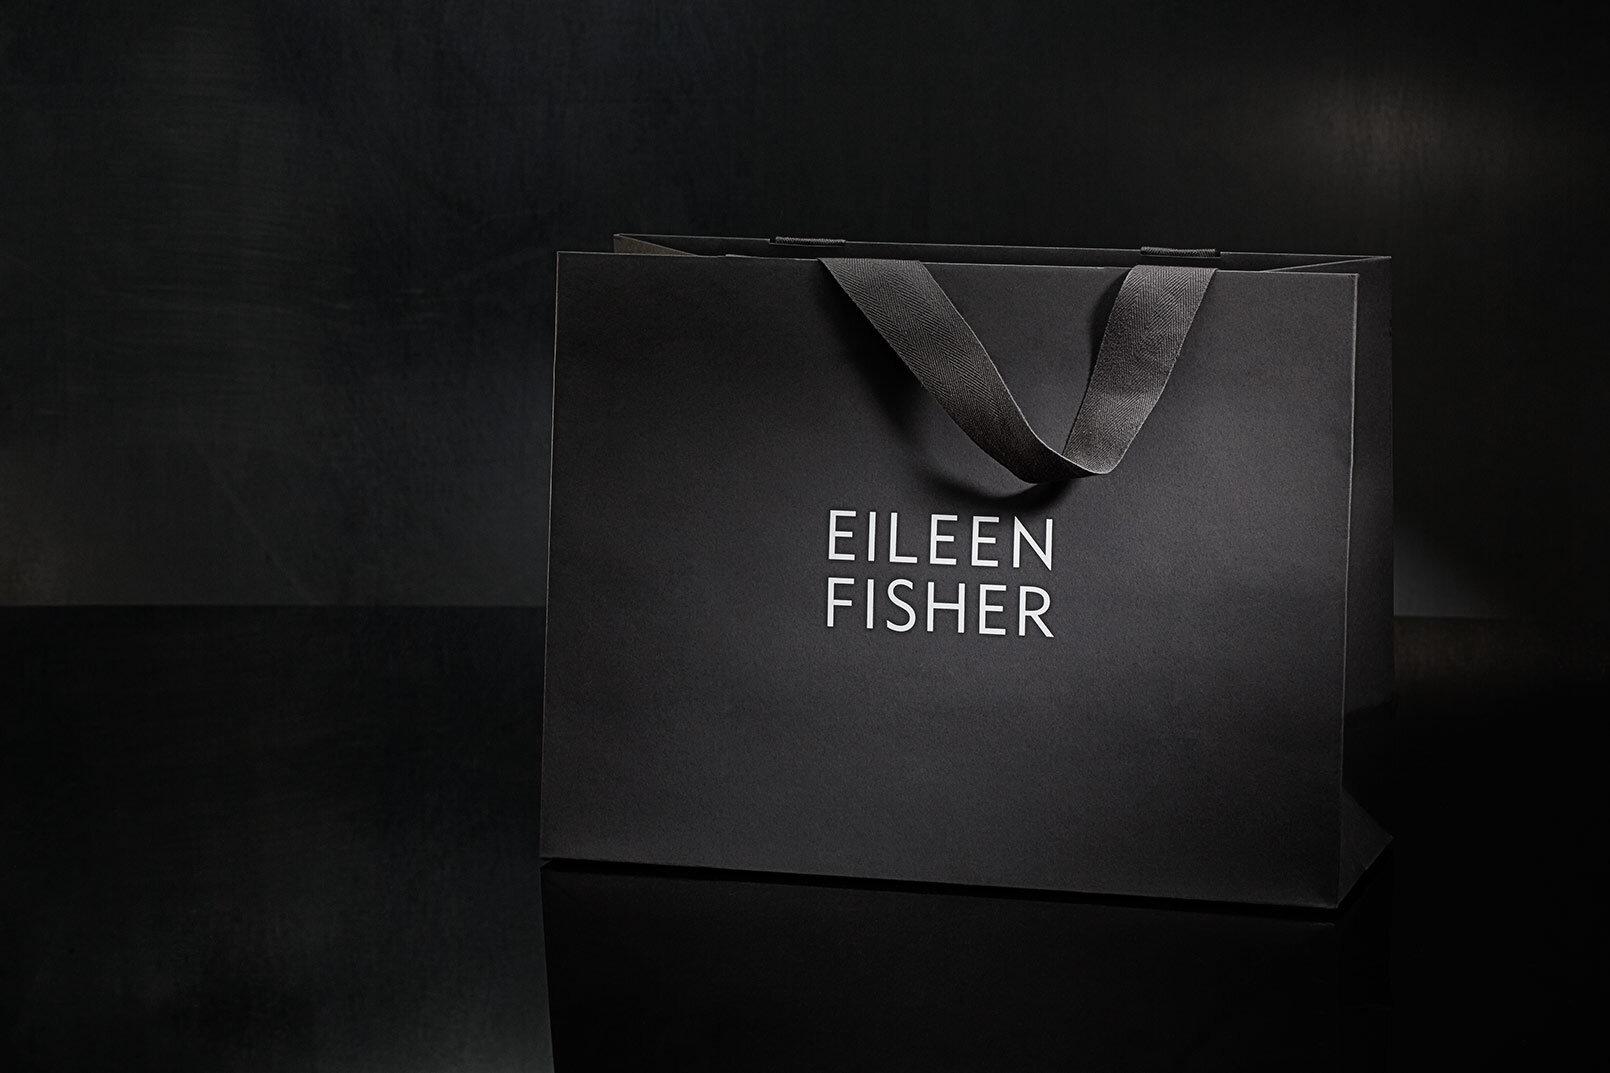 Eileen-Fisher-Shopping-Bag-Design-Packaging-Company-1.jpg